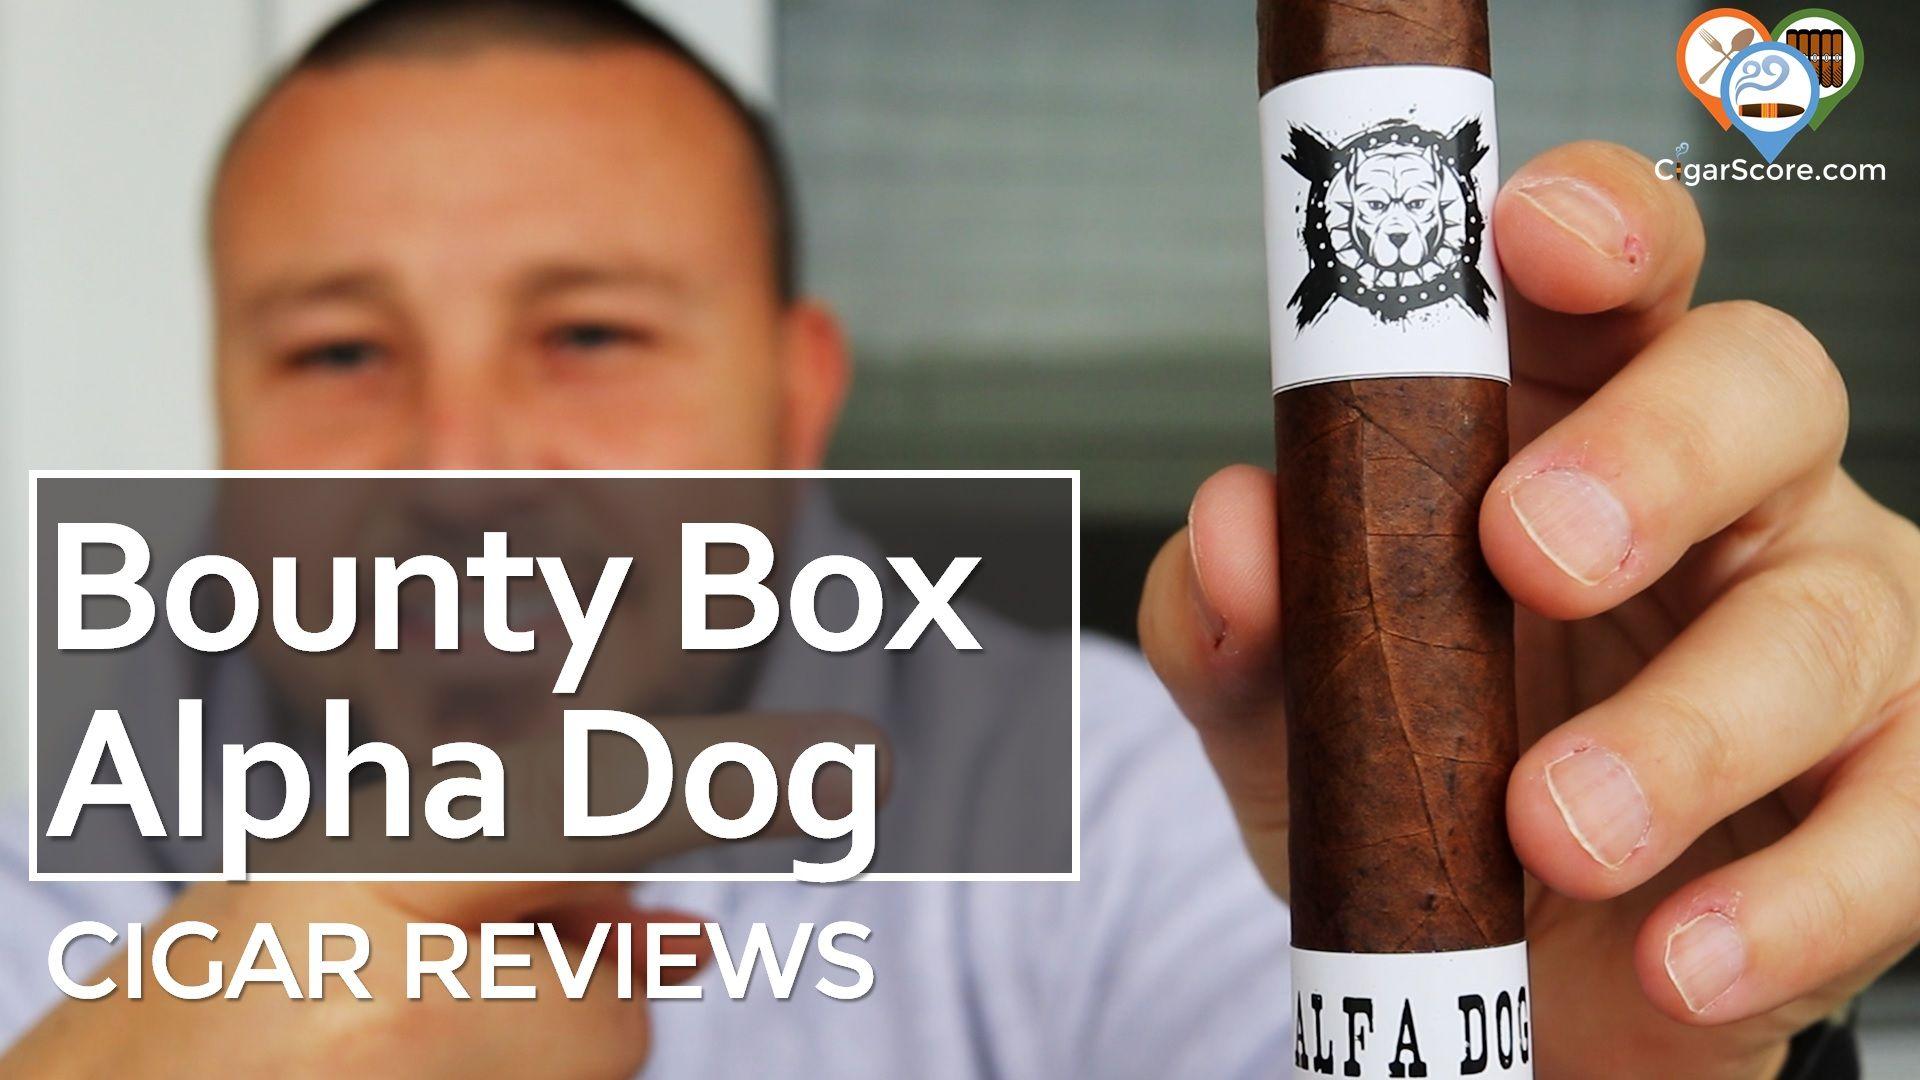 Cigar Review - Bounty Box Alpha Dog